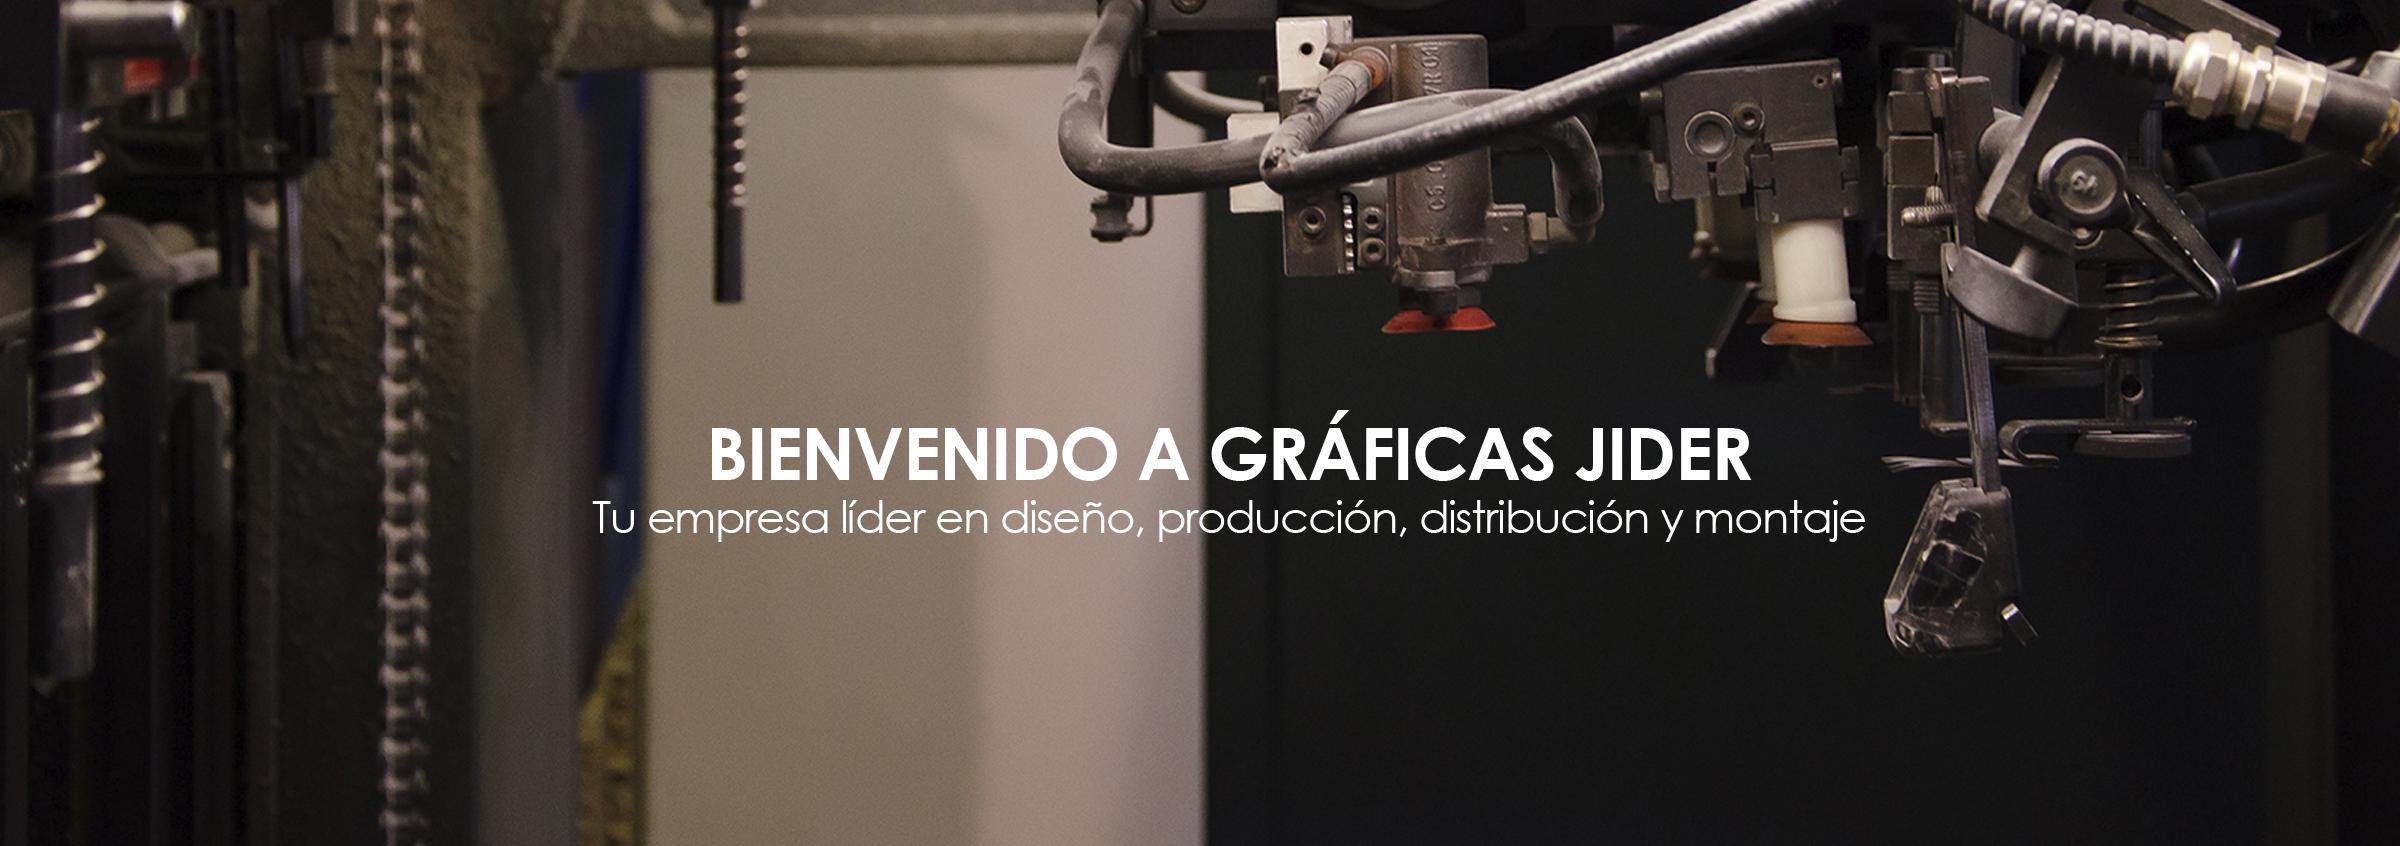 slider-graficas-jider-3-OK